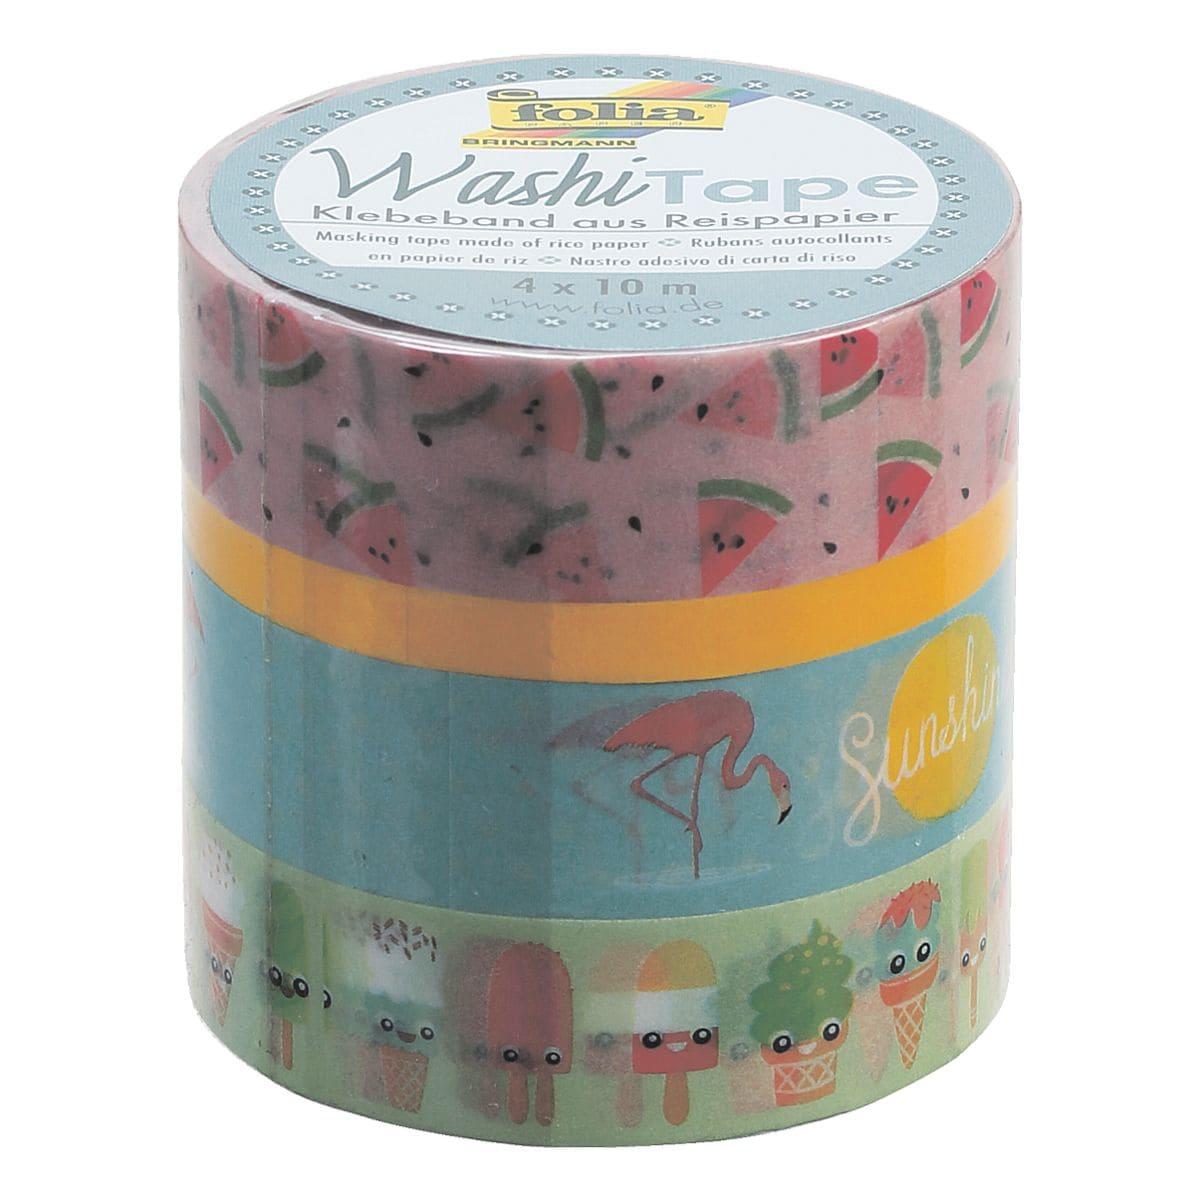 4x folia deko klebeband washi tape tropical farbig wieder. Black Bedroom Furniture Sets. Home Design Ideas